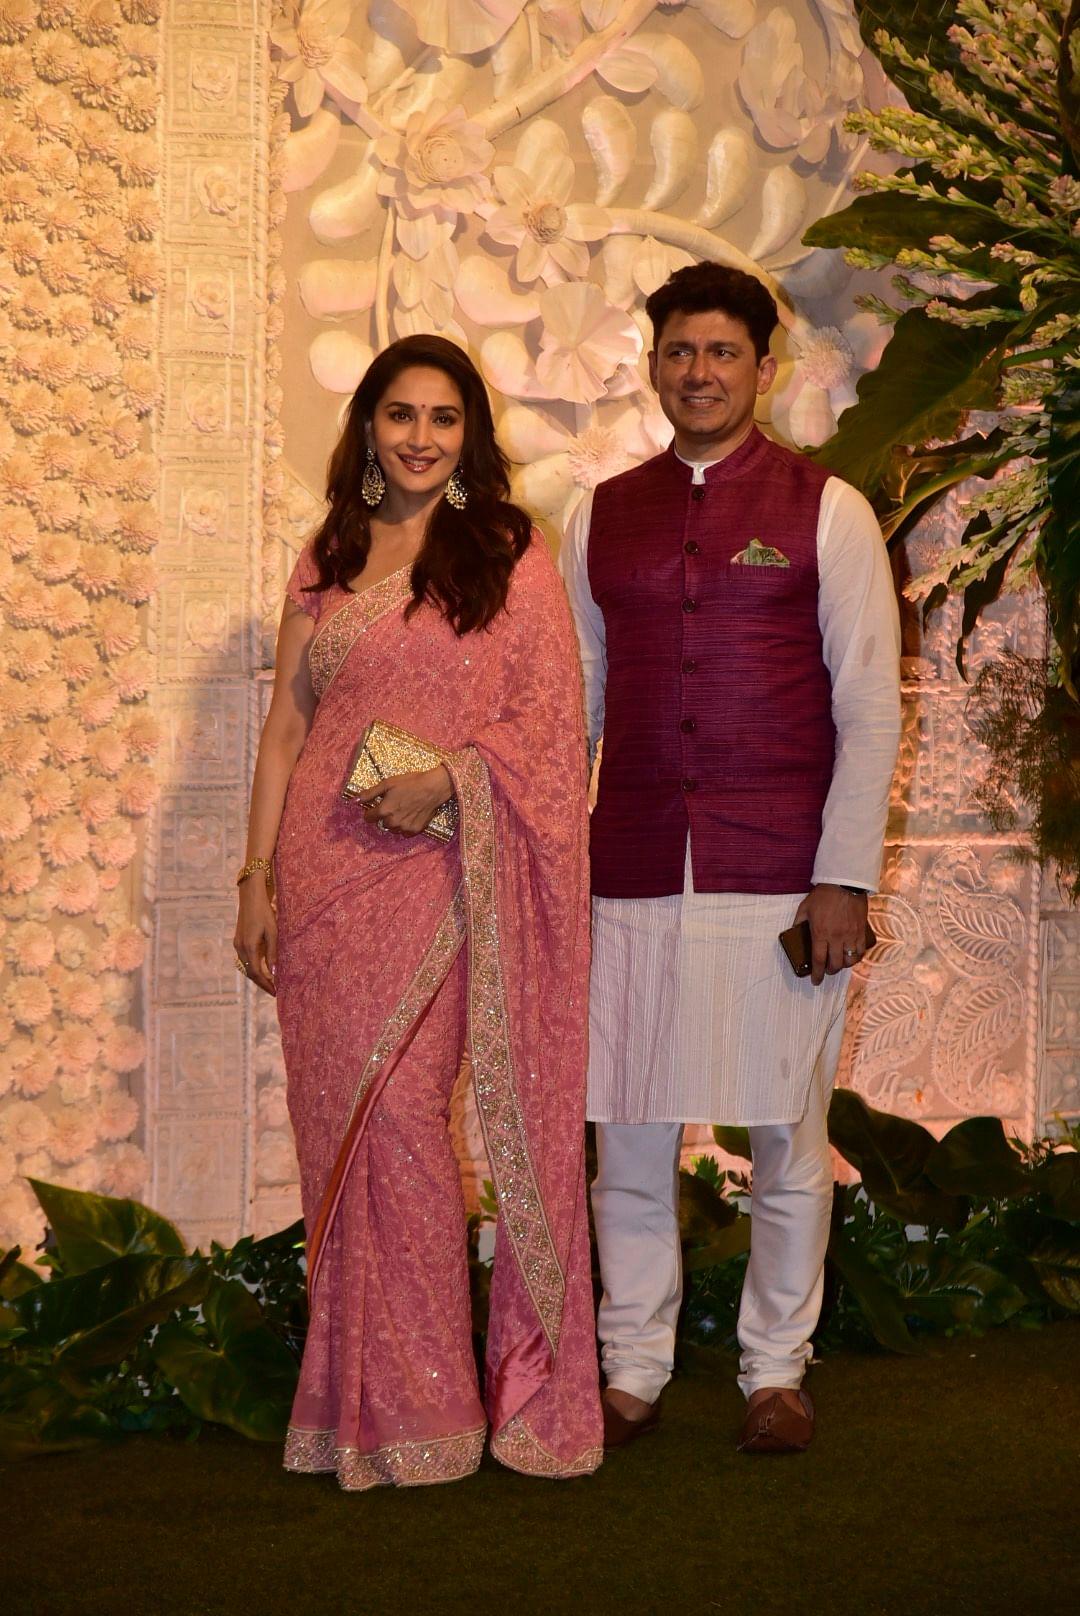 Madhuri Dixit and Sriram Madhav Nene